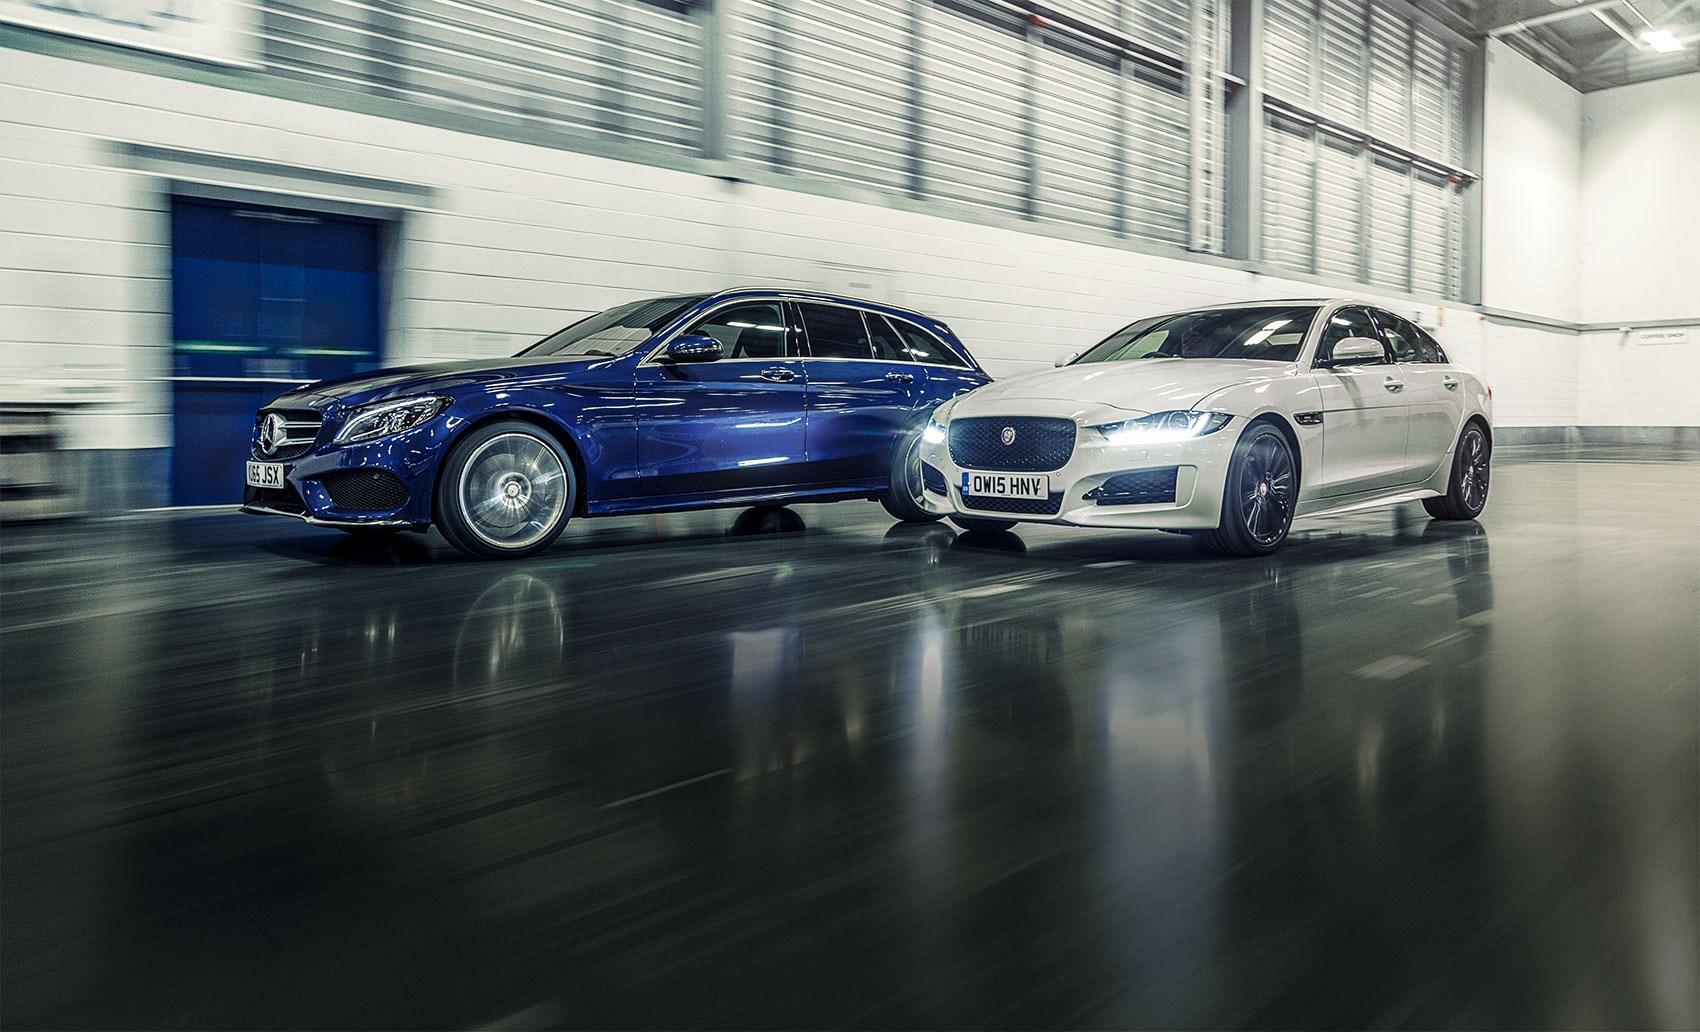 2016 39 s top leasing deals mercedes c class or jaguar xe for Mercedes benz lease seattle